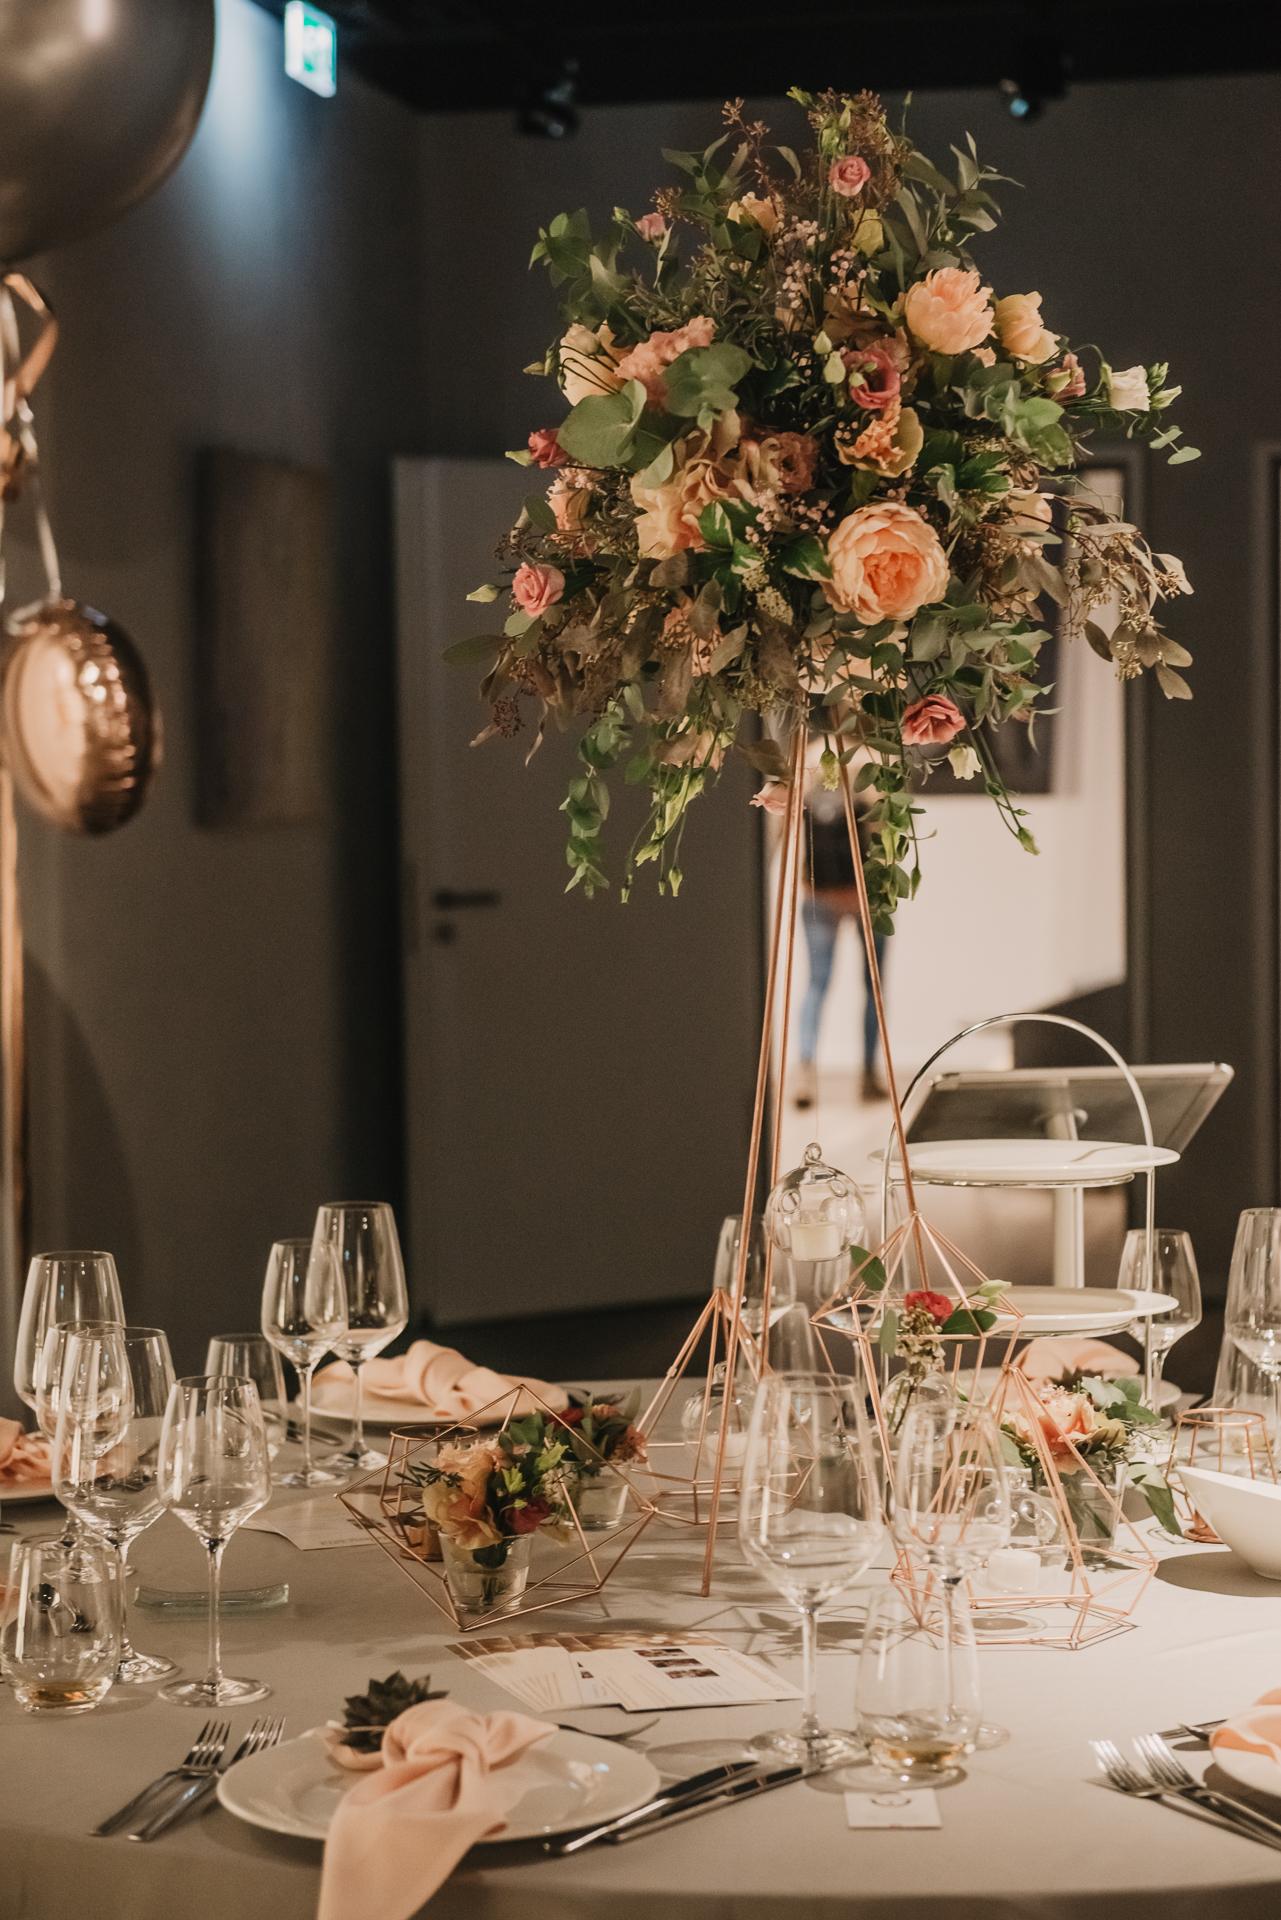 Zweinander-LeonoreHerzog-WeddingMarket-OnTour20191110-9688